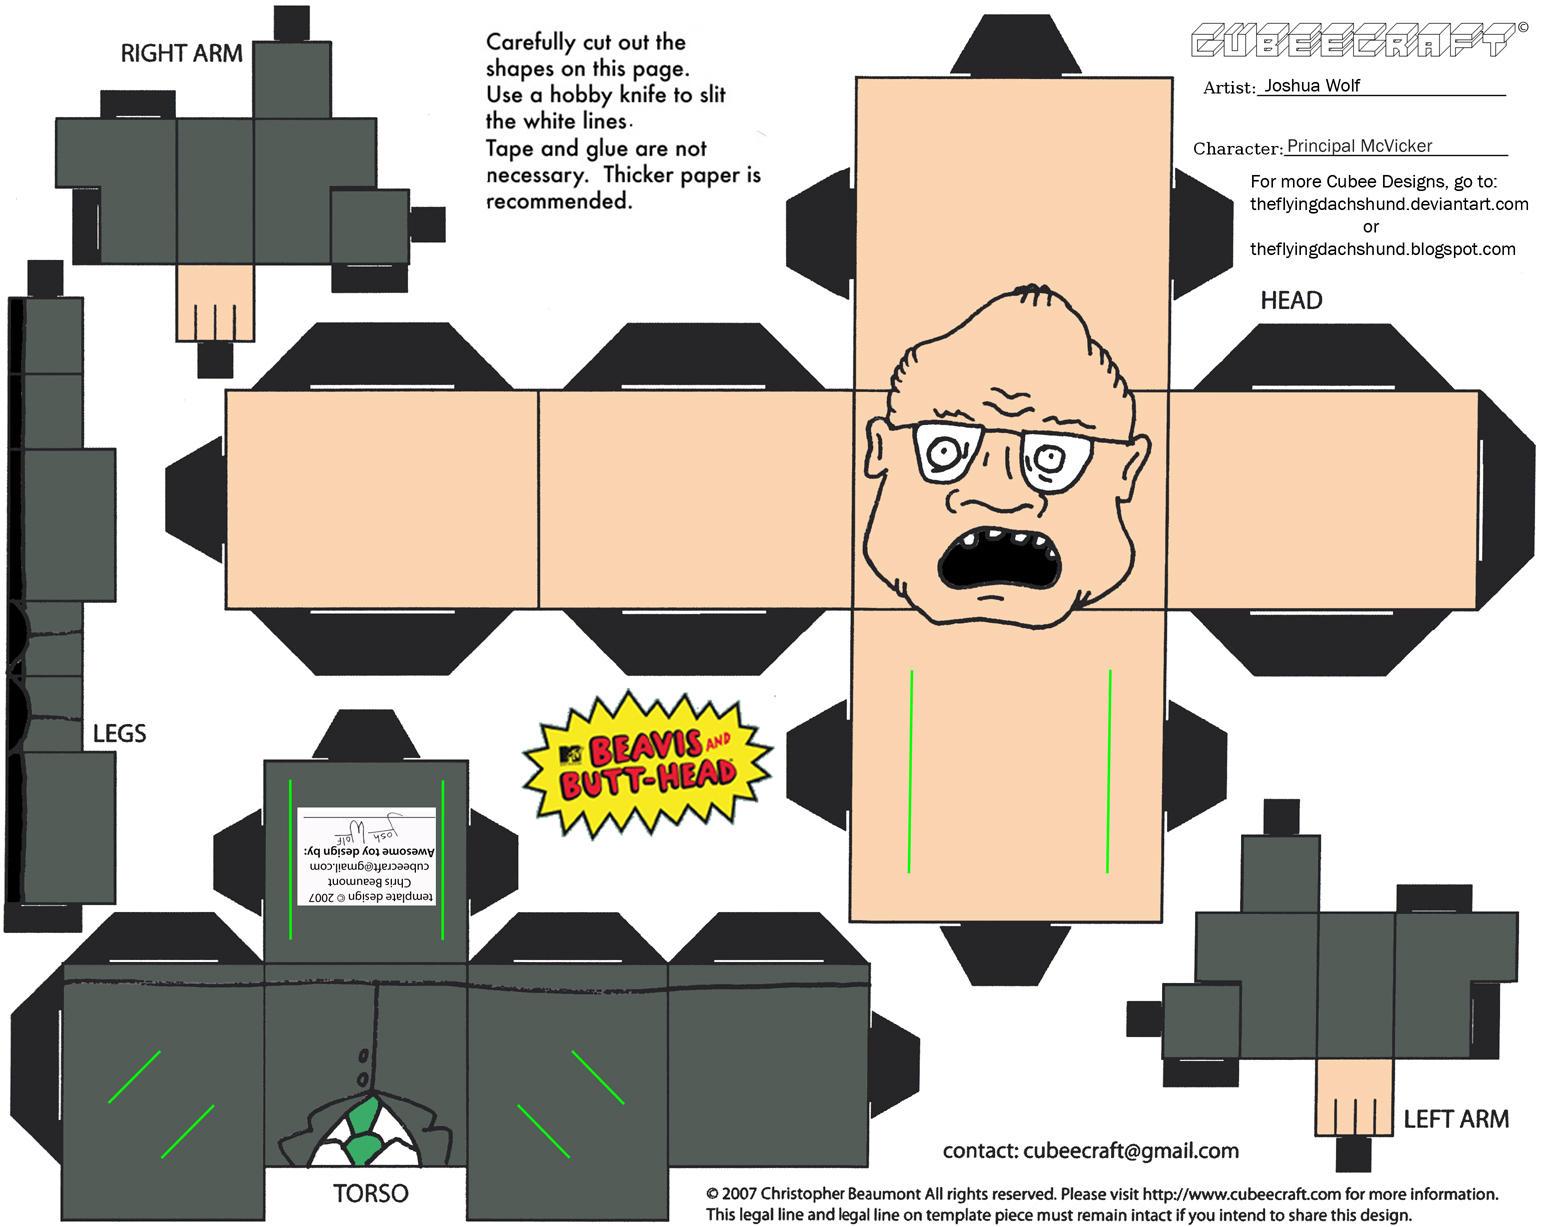 MJC 4: Principal McVicker Cubee by TheFlyingDachshund